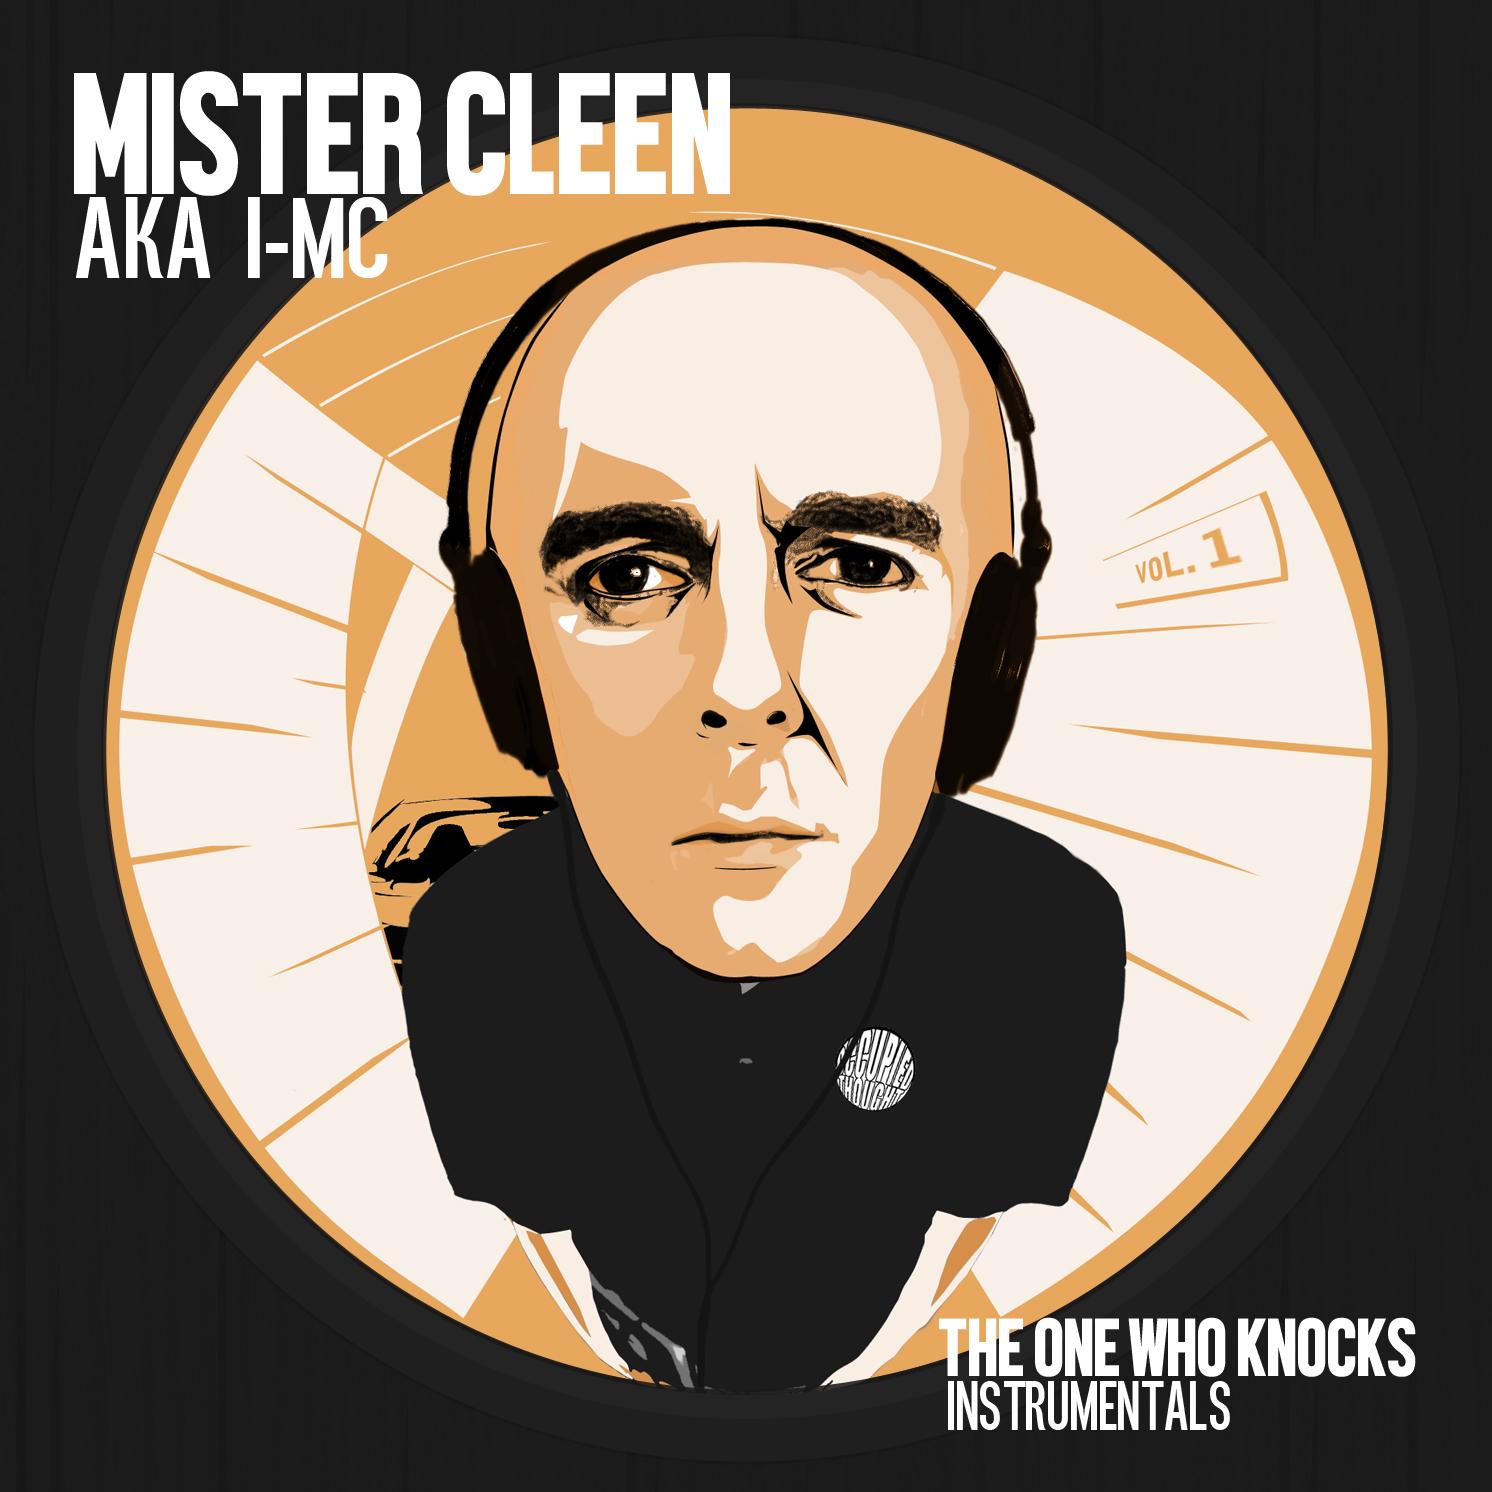 The One Who Knocks - 2017